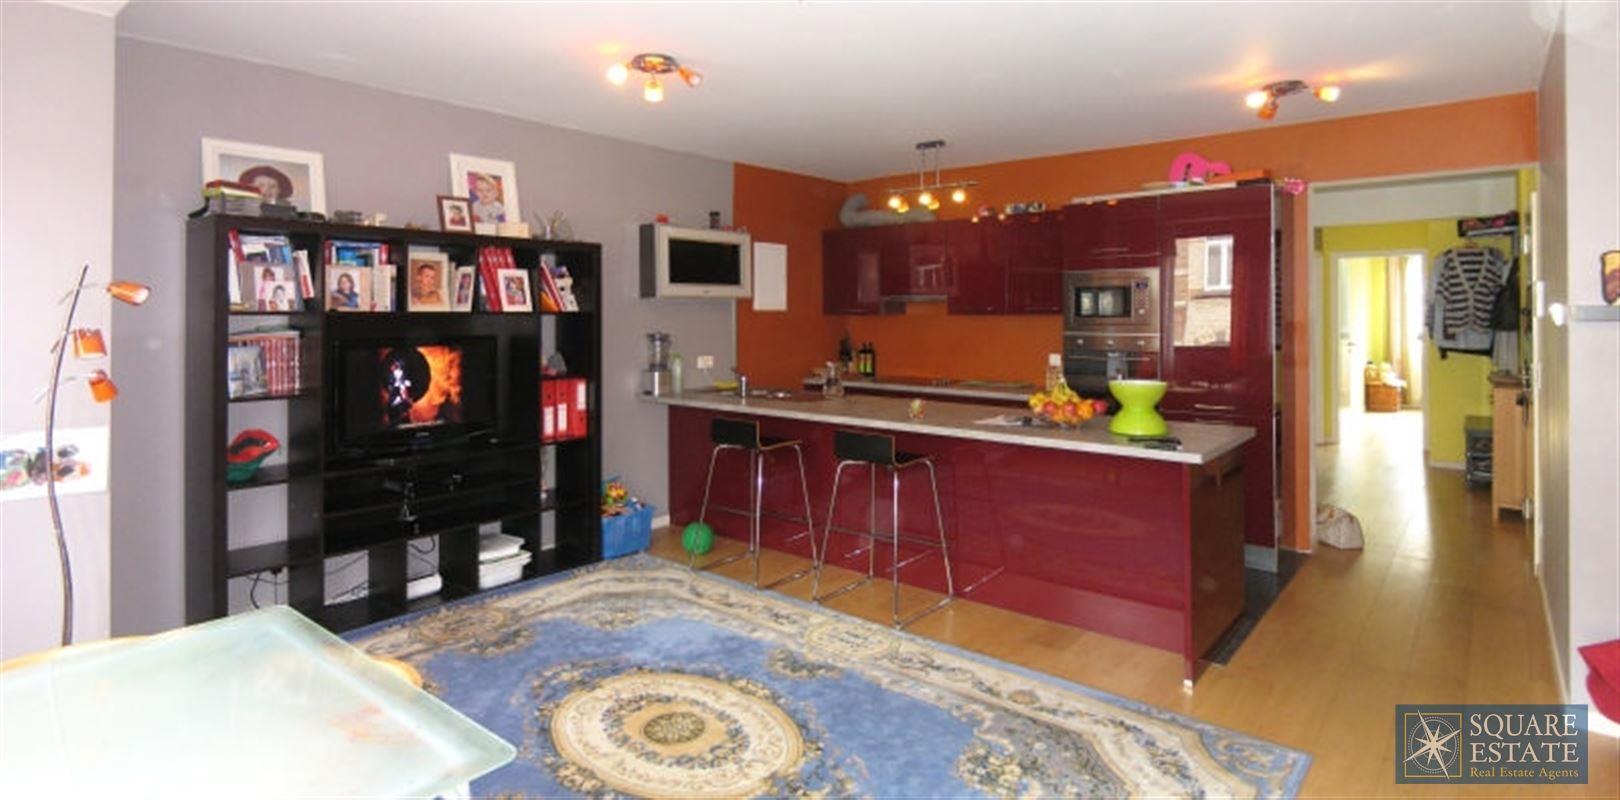 Foto 2 : Appartement te 1090 JETTE (België) - Prijs € 850